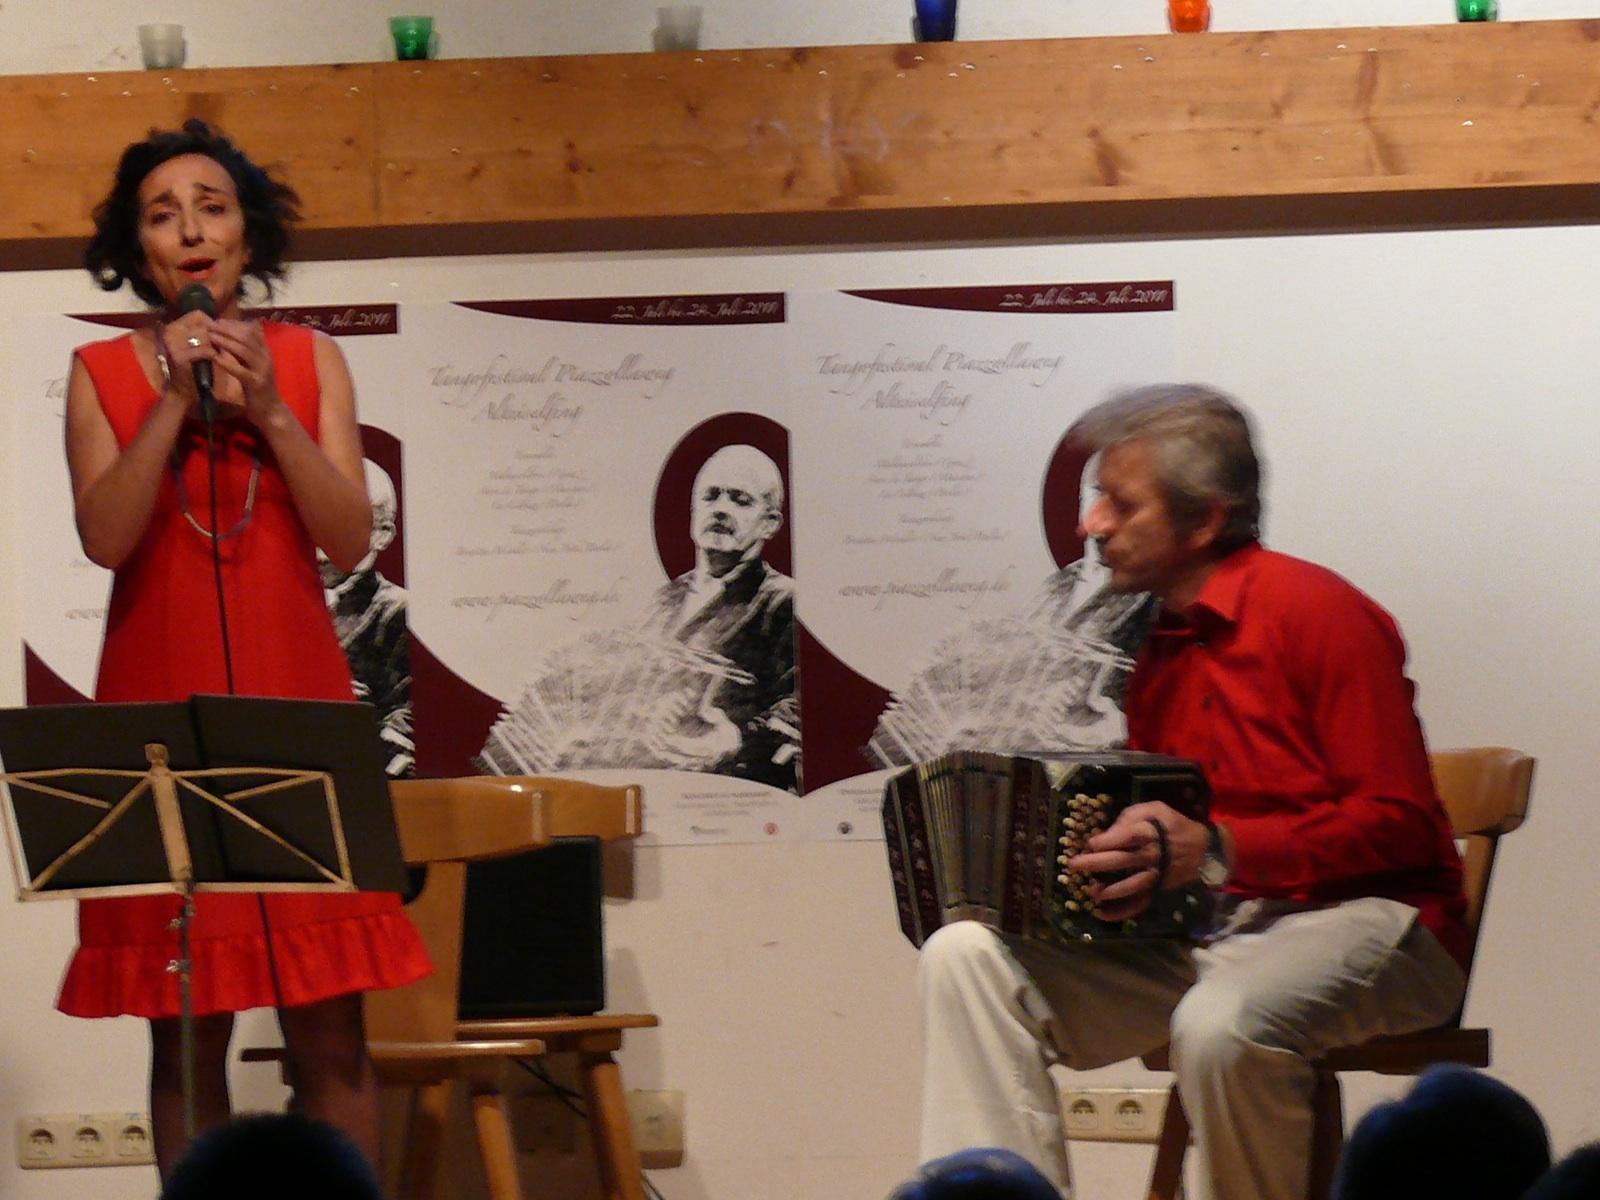 Sandra Nahbian Festivalband